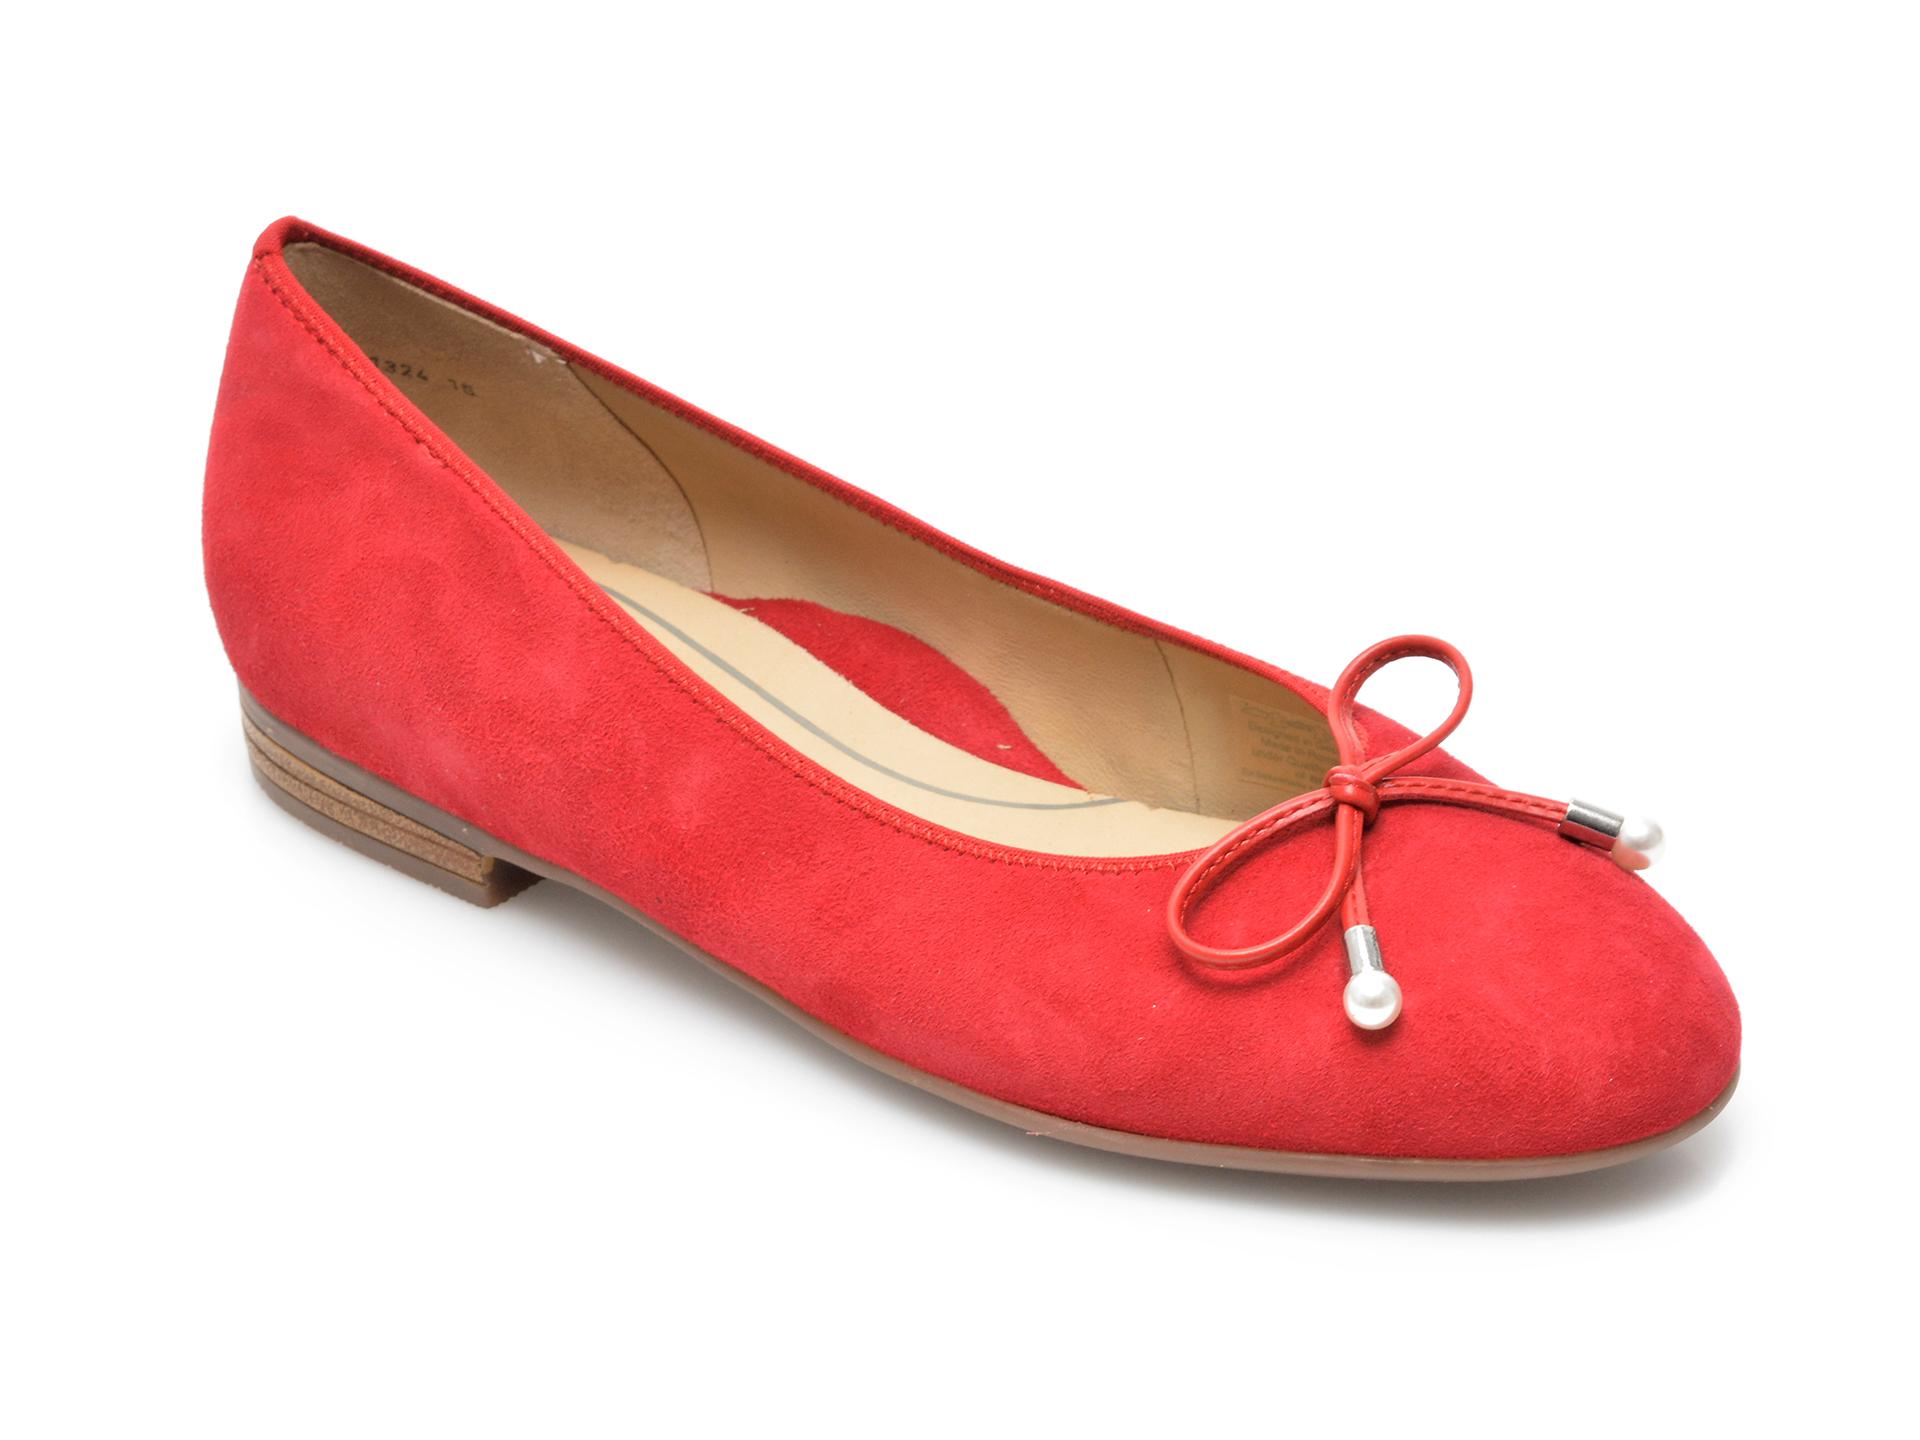 Balerini dama ARA, 31324, din piele intoarsa rosii